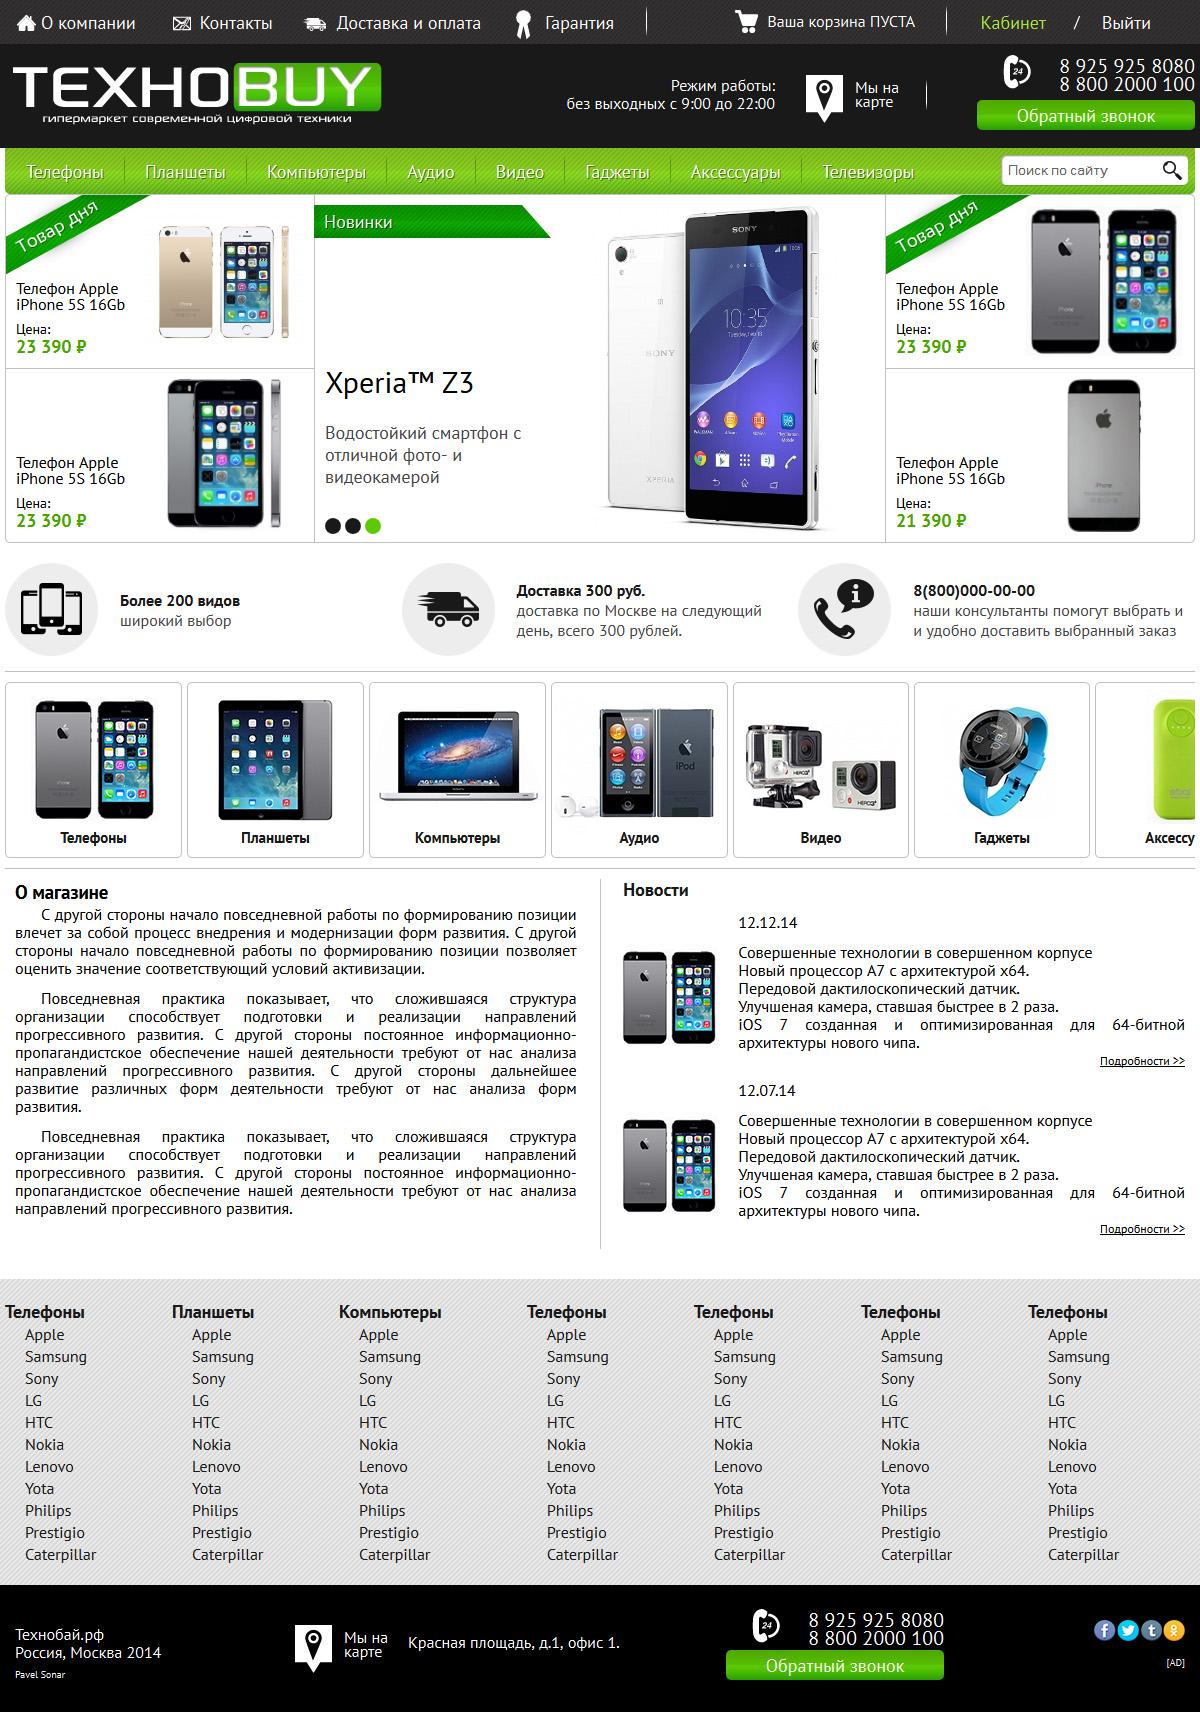 Интернет-магазин Технобай.рф